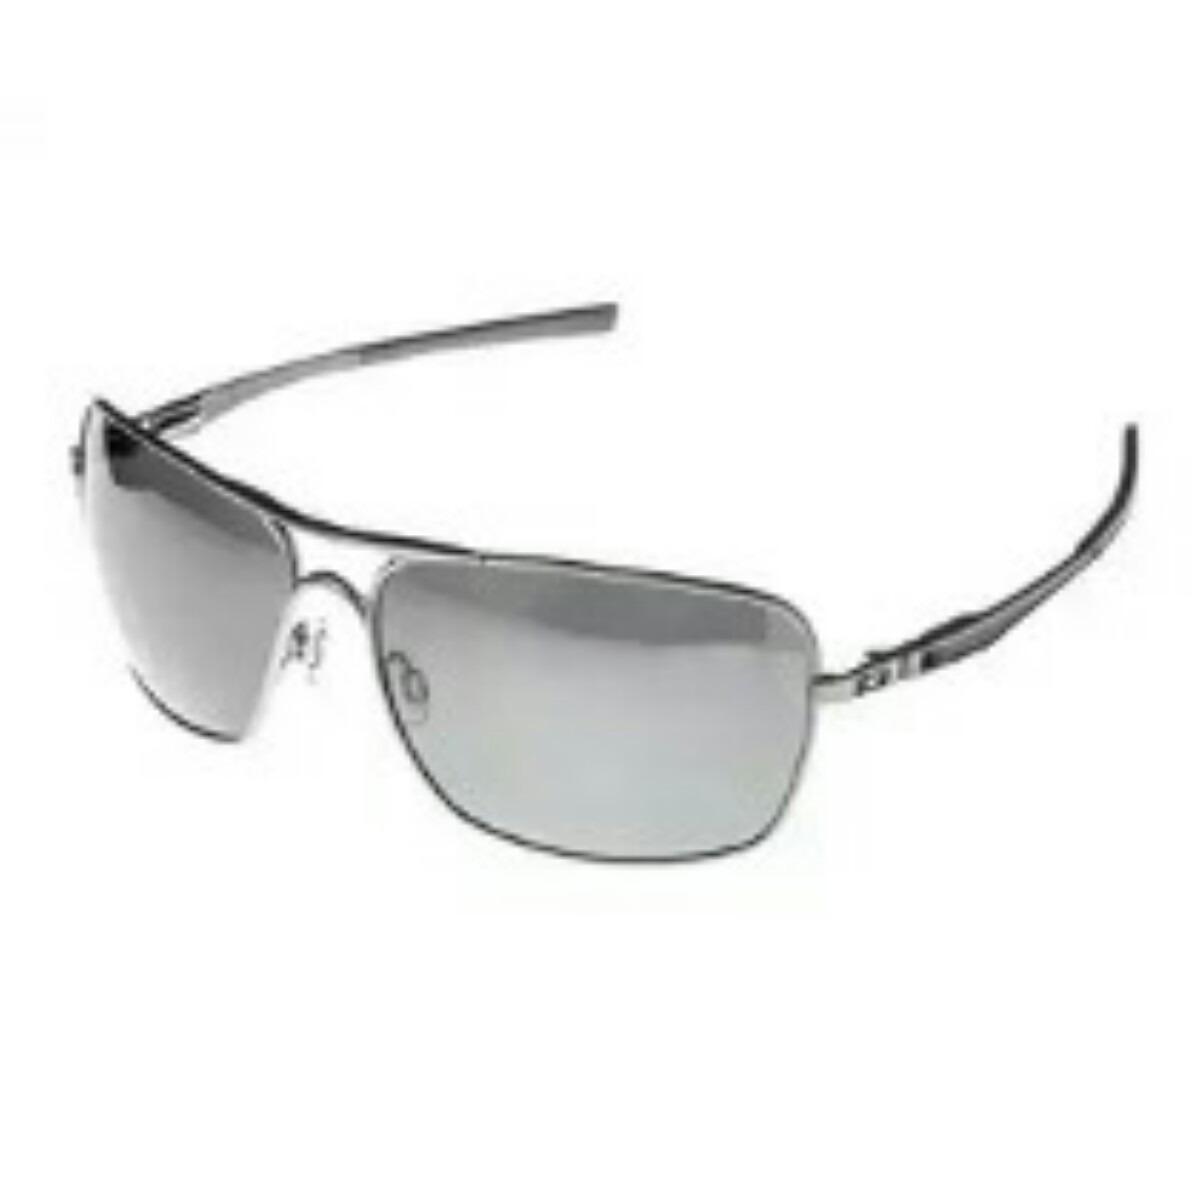 02818cc94e5a1 óculos de sol oakley polarizado plaintiff squared oo4063-03. Carregando zoom .